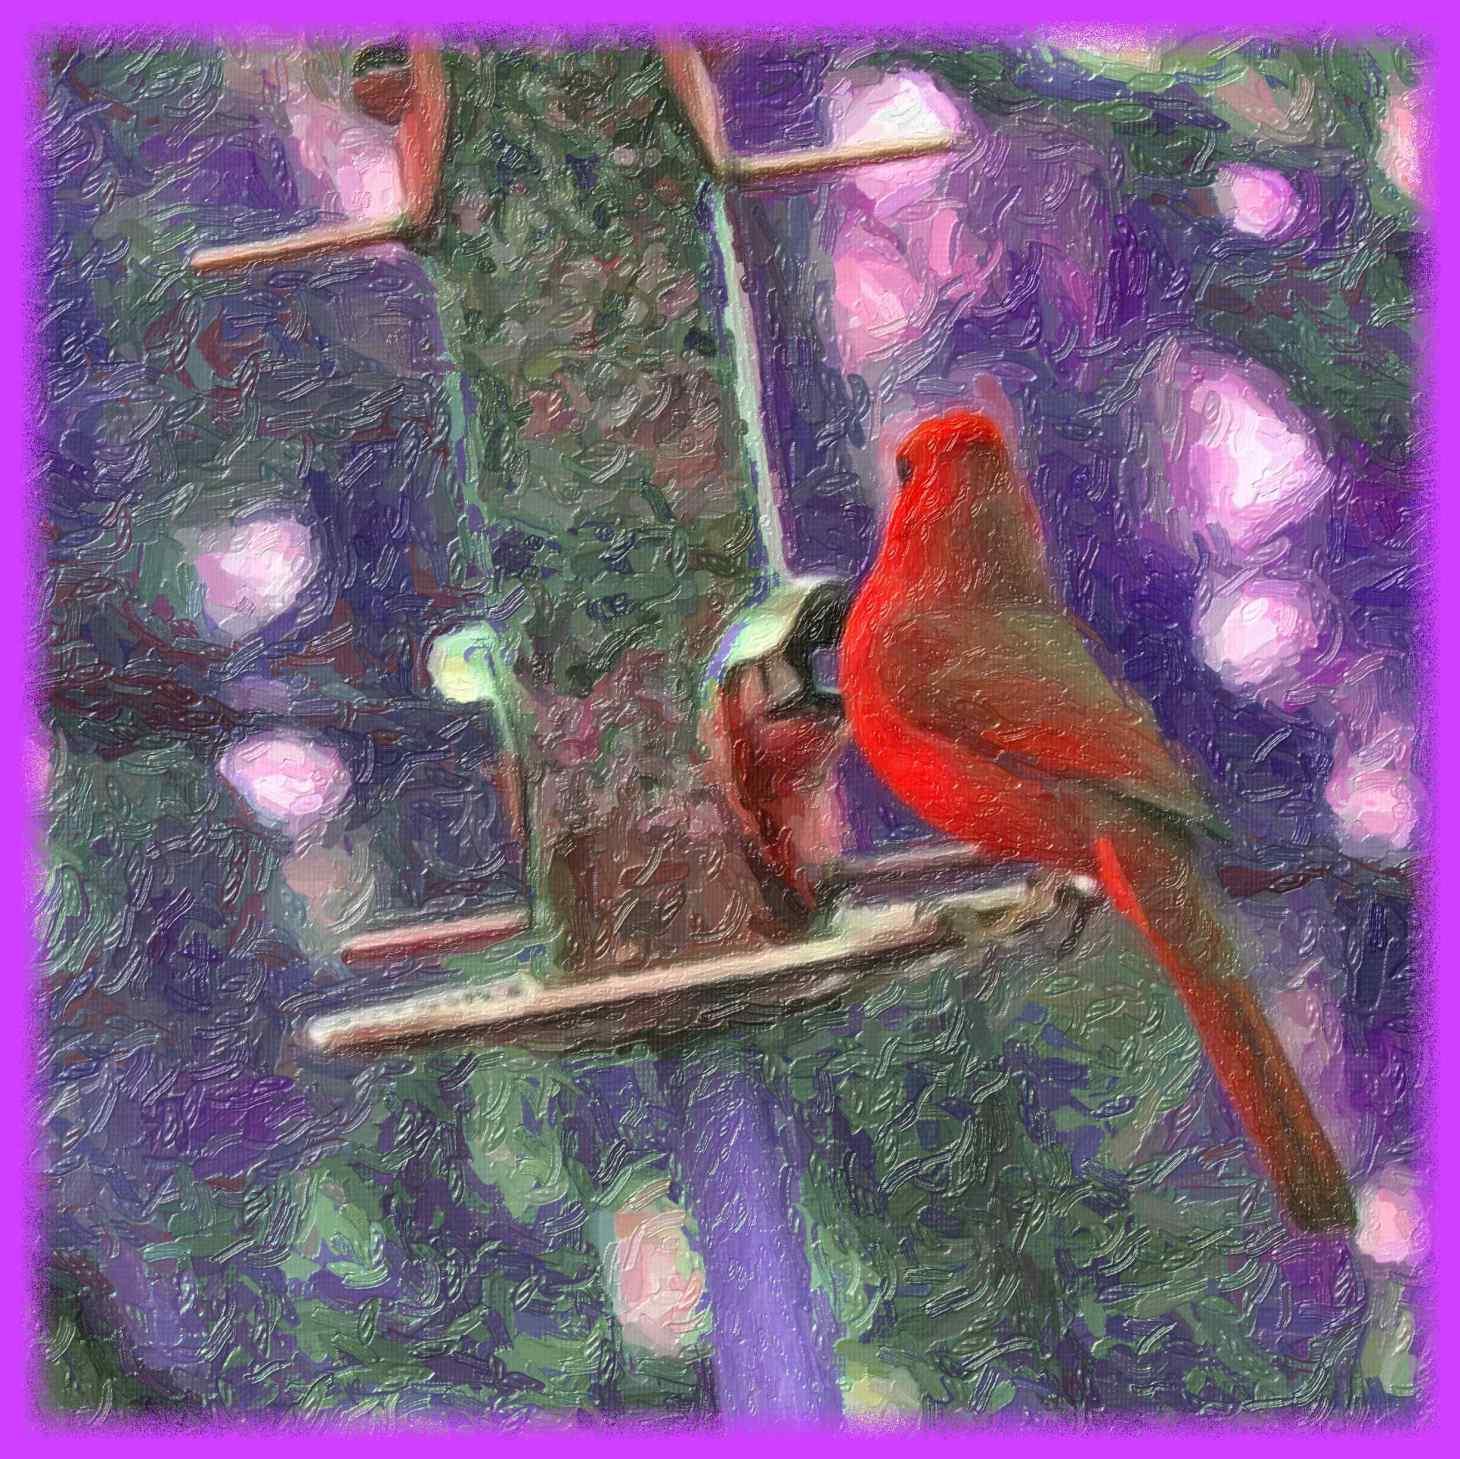 Red Cardinal (2) Ditital Photo Art by Thomas Peace c. 2016